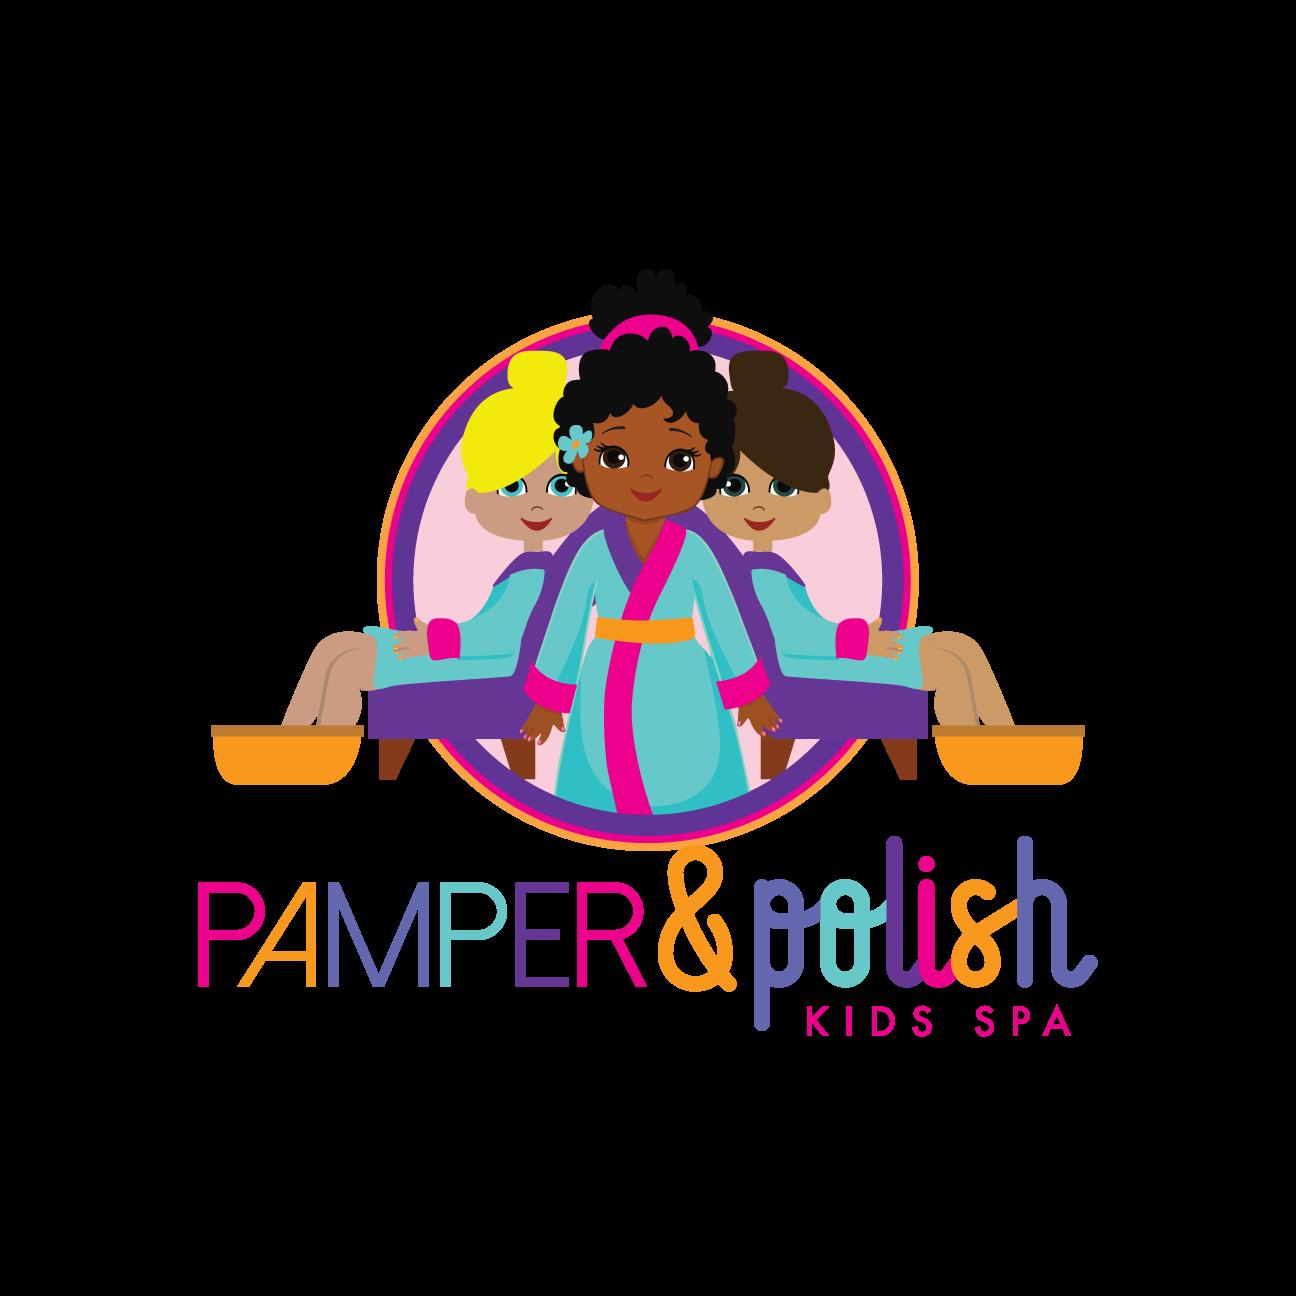 Pamper & Polish Kids Spa Referral Program